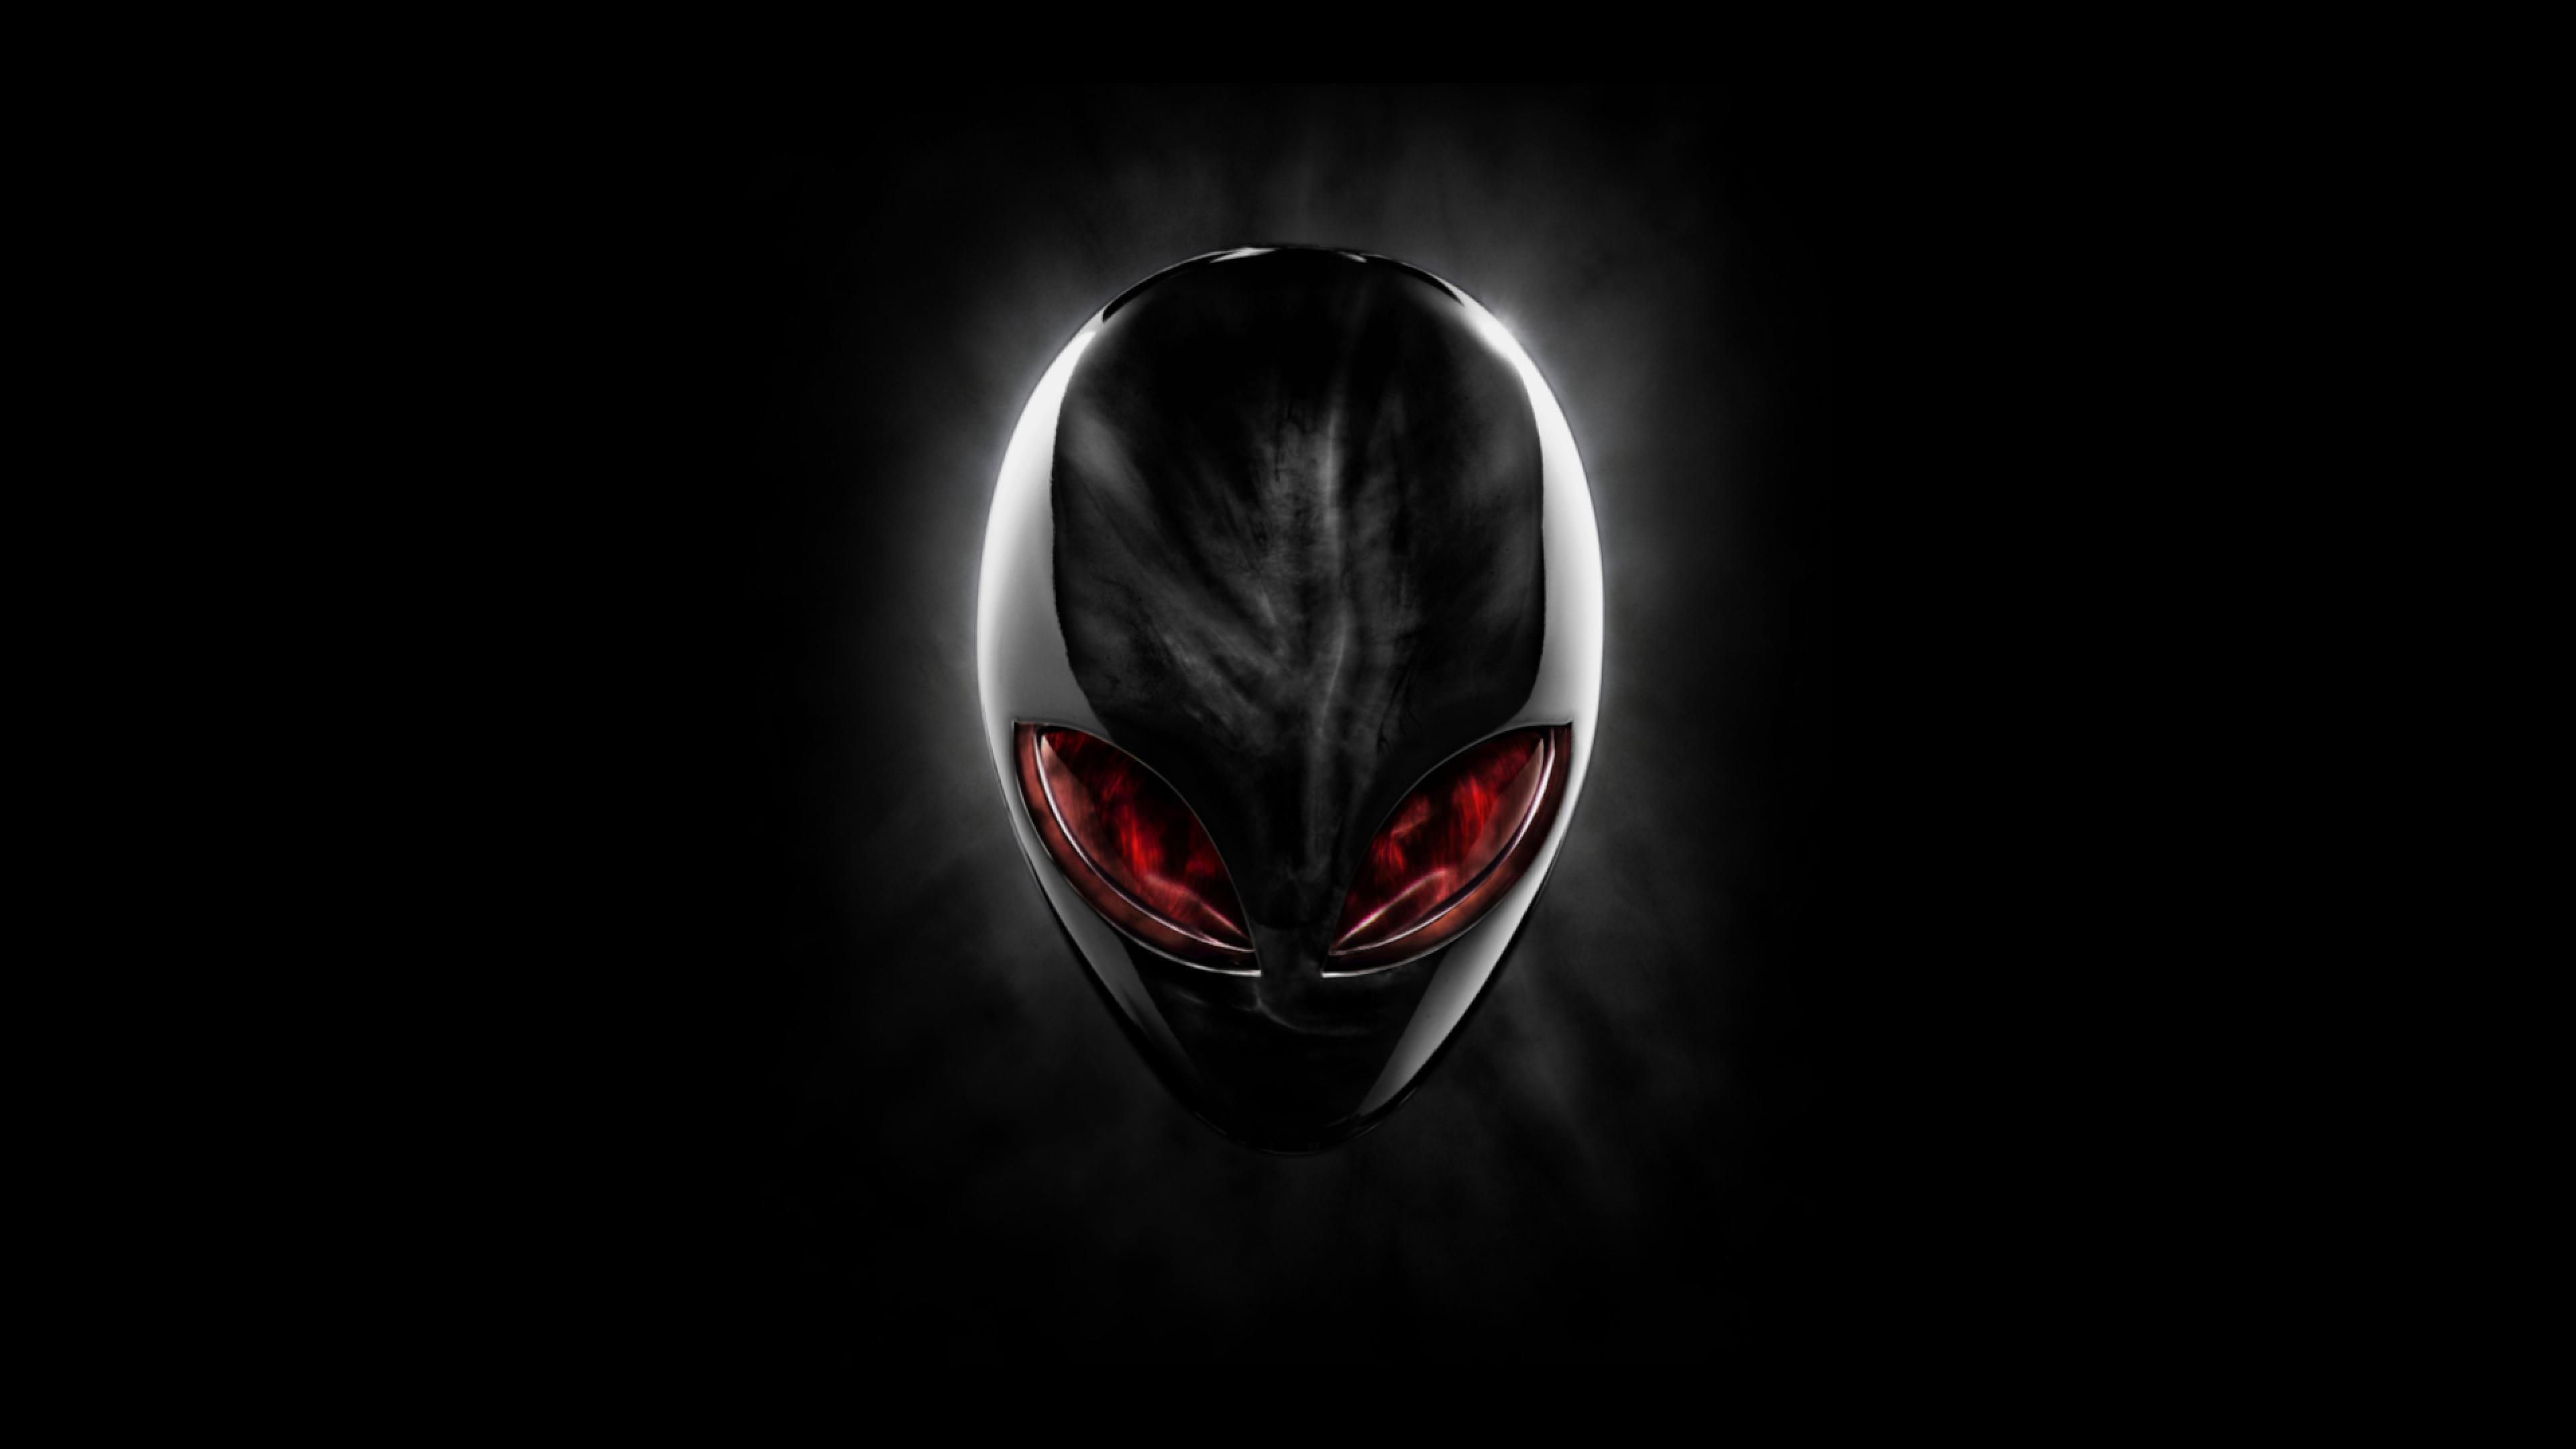 alienware logos Ultra or Dual High Definition 2560x1440 3840x1080 3840x2160